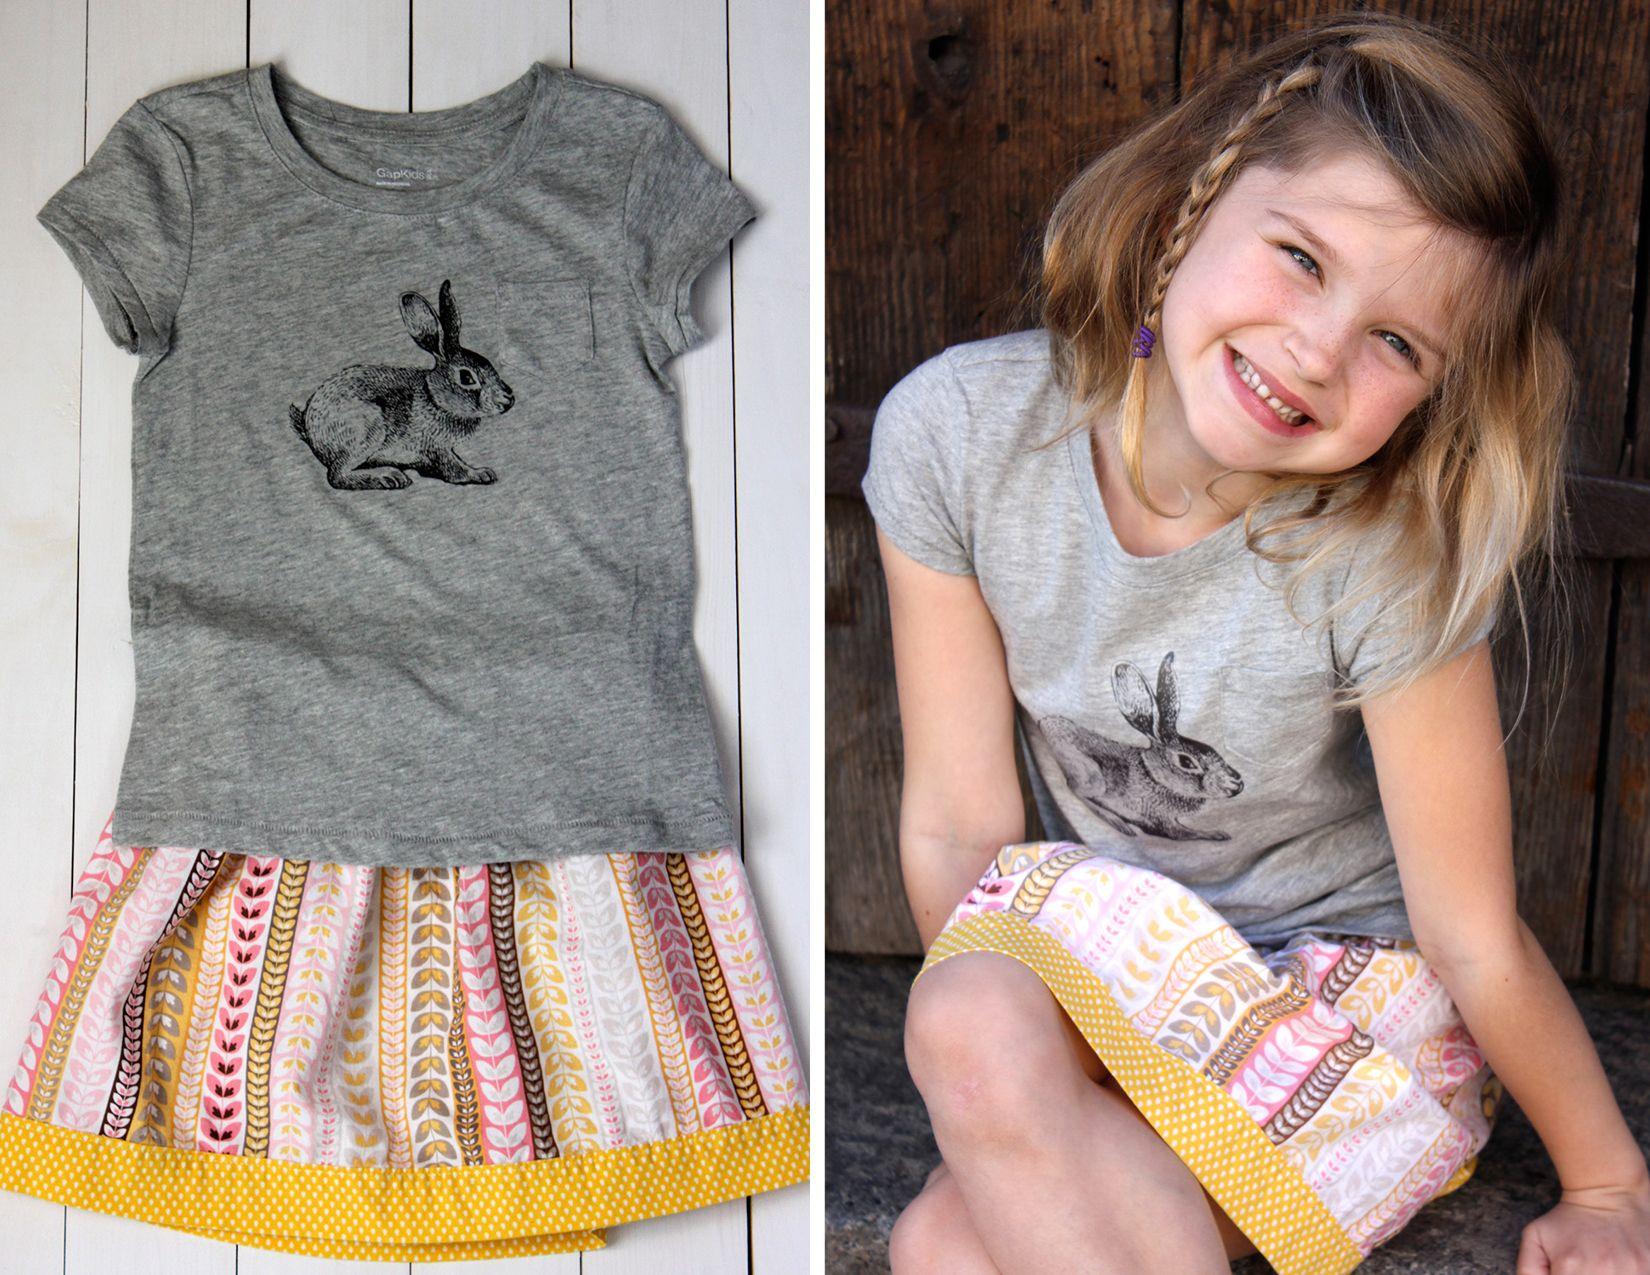 Free printable for a DIY bunny iron-on t-shirt! diy-bunny-shirt Iron-on transfer on aliceandlois.com